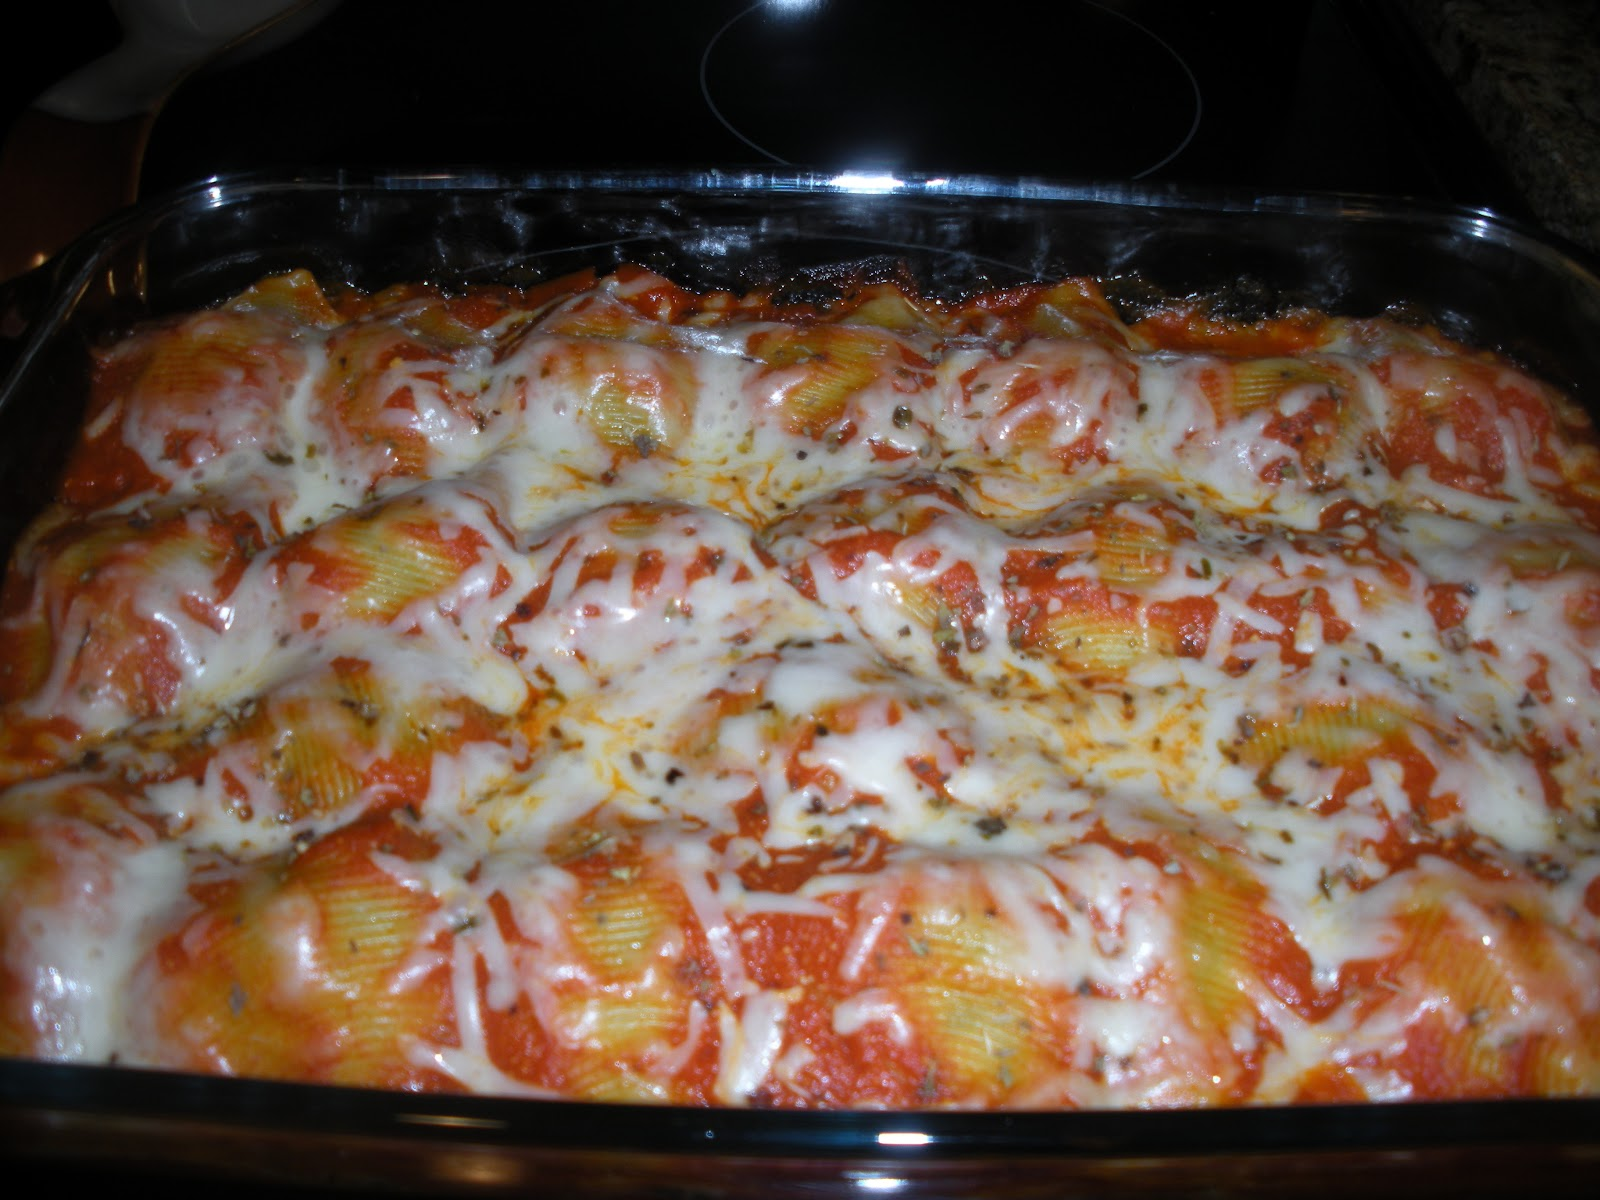 Hazelnut And Turkey-Sausage Stuffed Mushrooms Recipes — Dishmaps